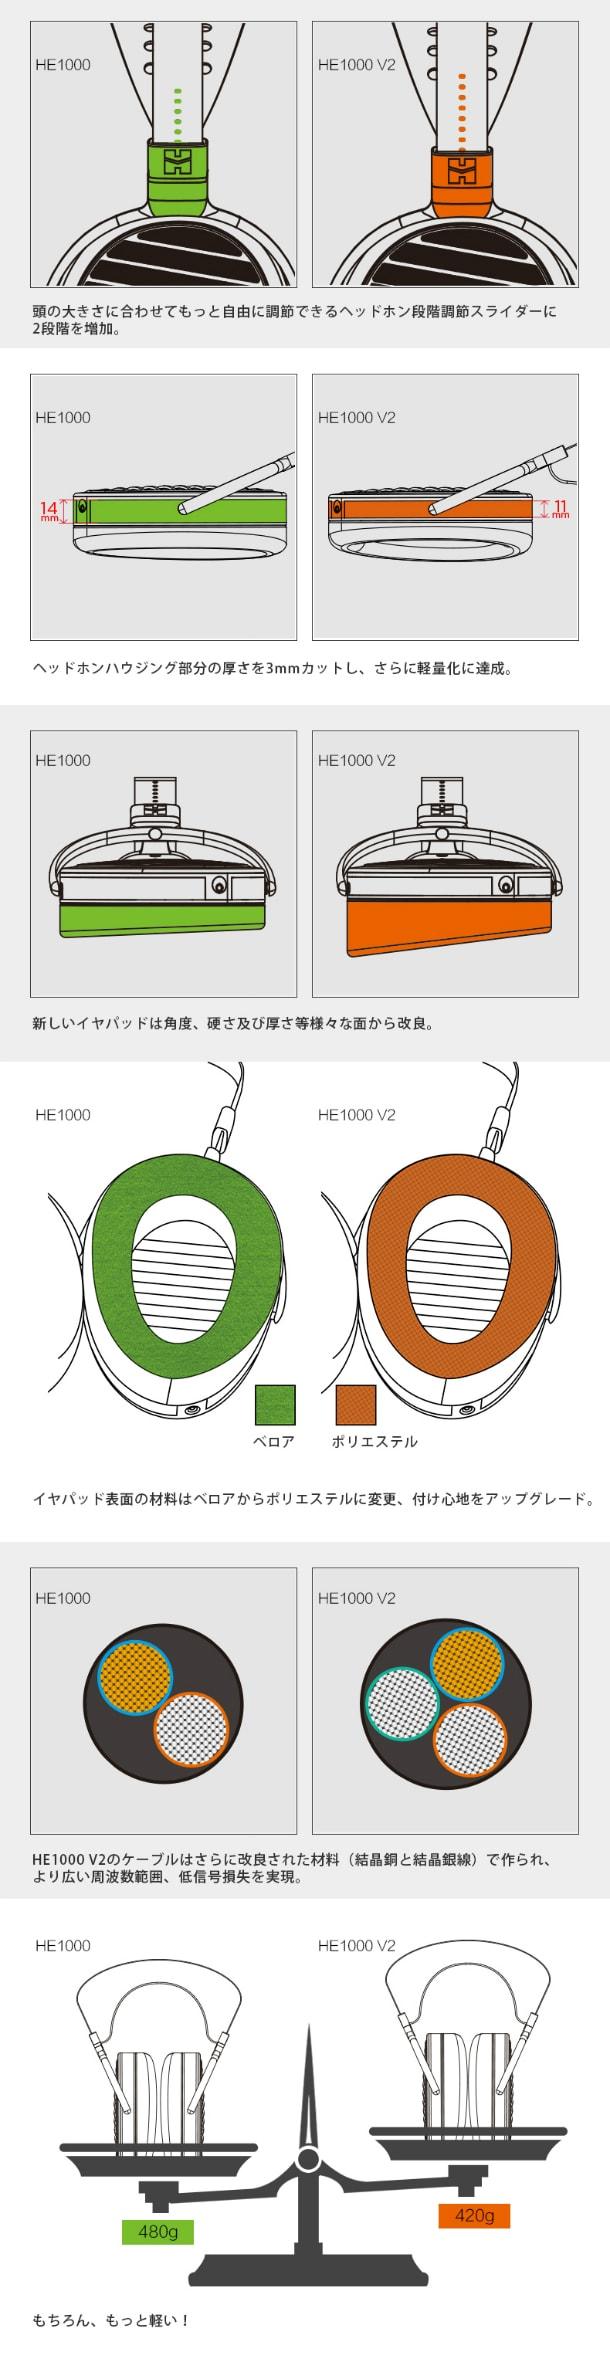 HE1000-新旧対照図 (1)-min